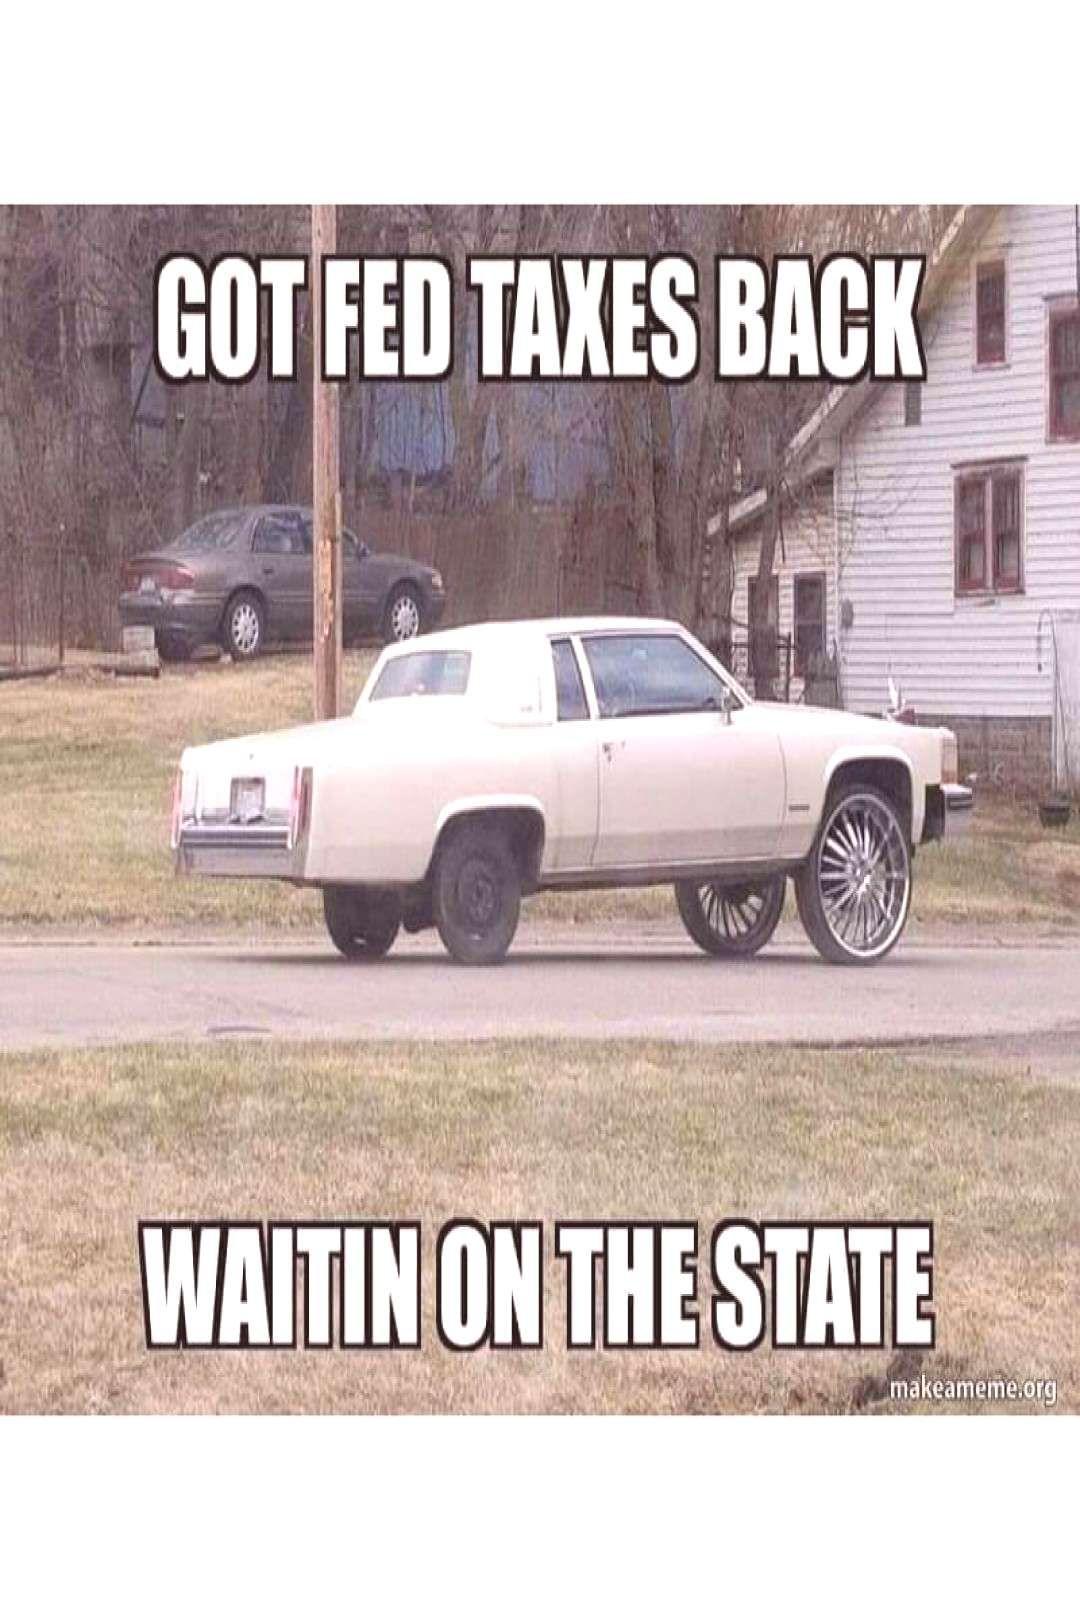 Moneymanagement Possible Meme Text That Says And Car Got Fed Meme And Car Possible Text That Says Got Fedyou In 2020 Budget Planner Memes Money Management